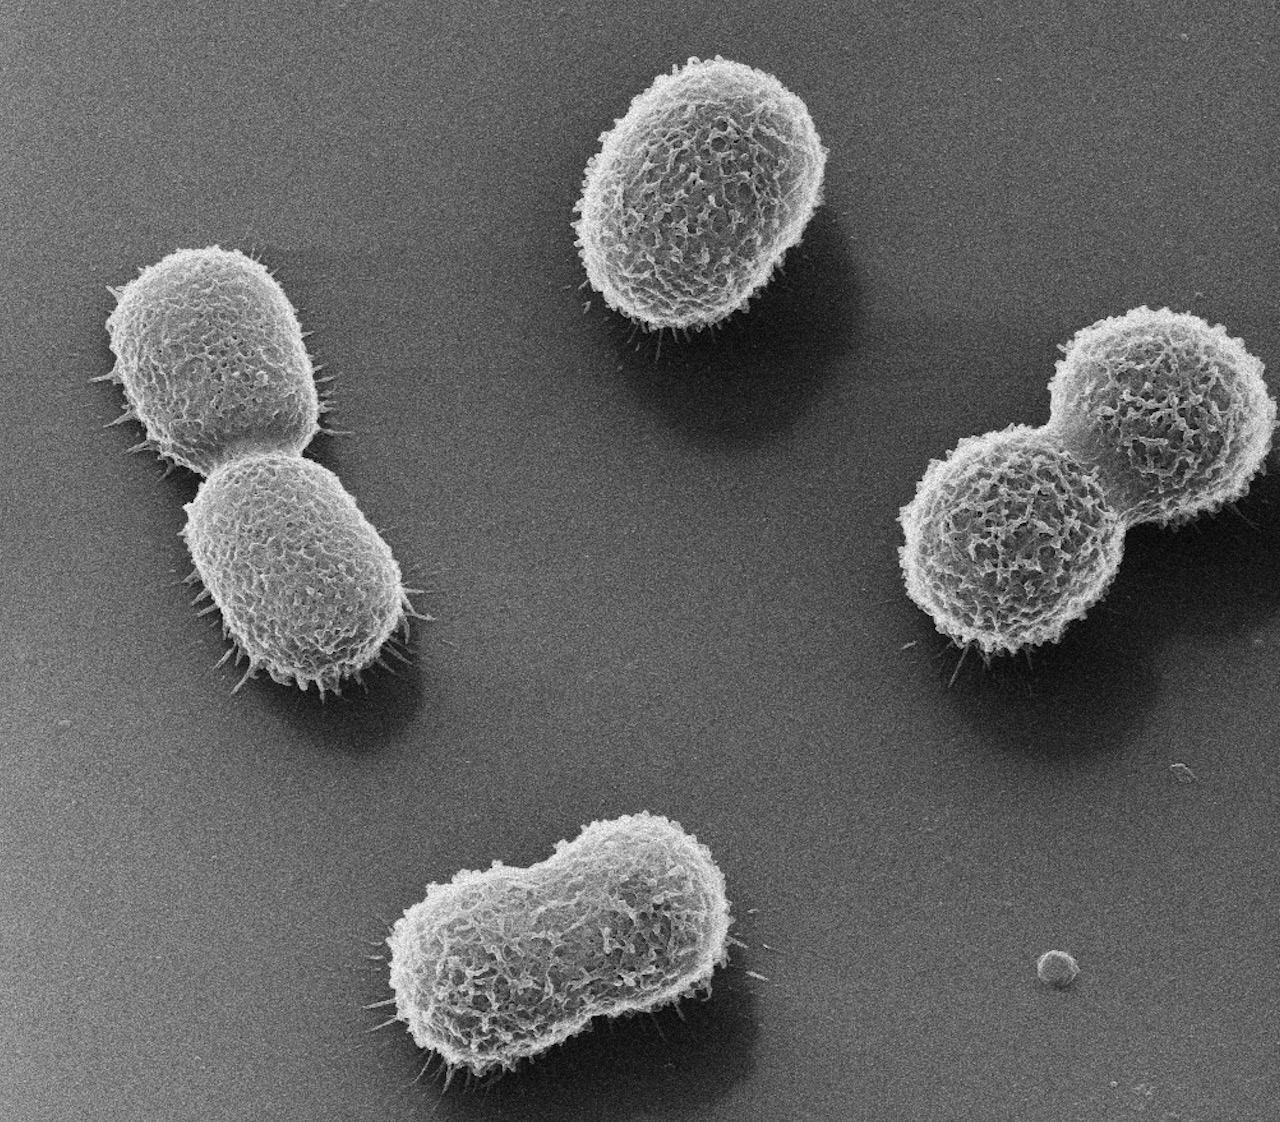 acinetobacter baumannii image � miphidic